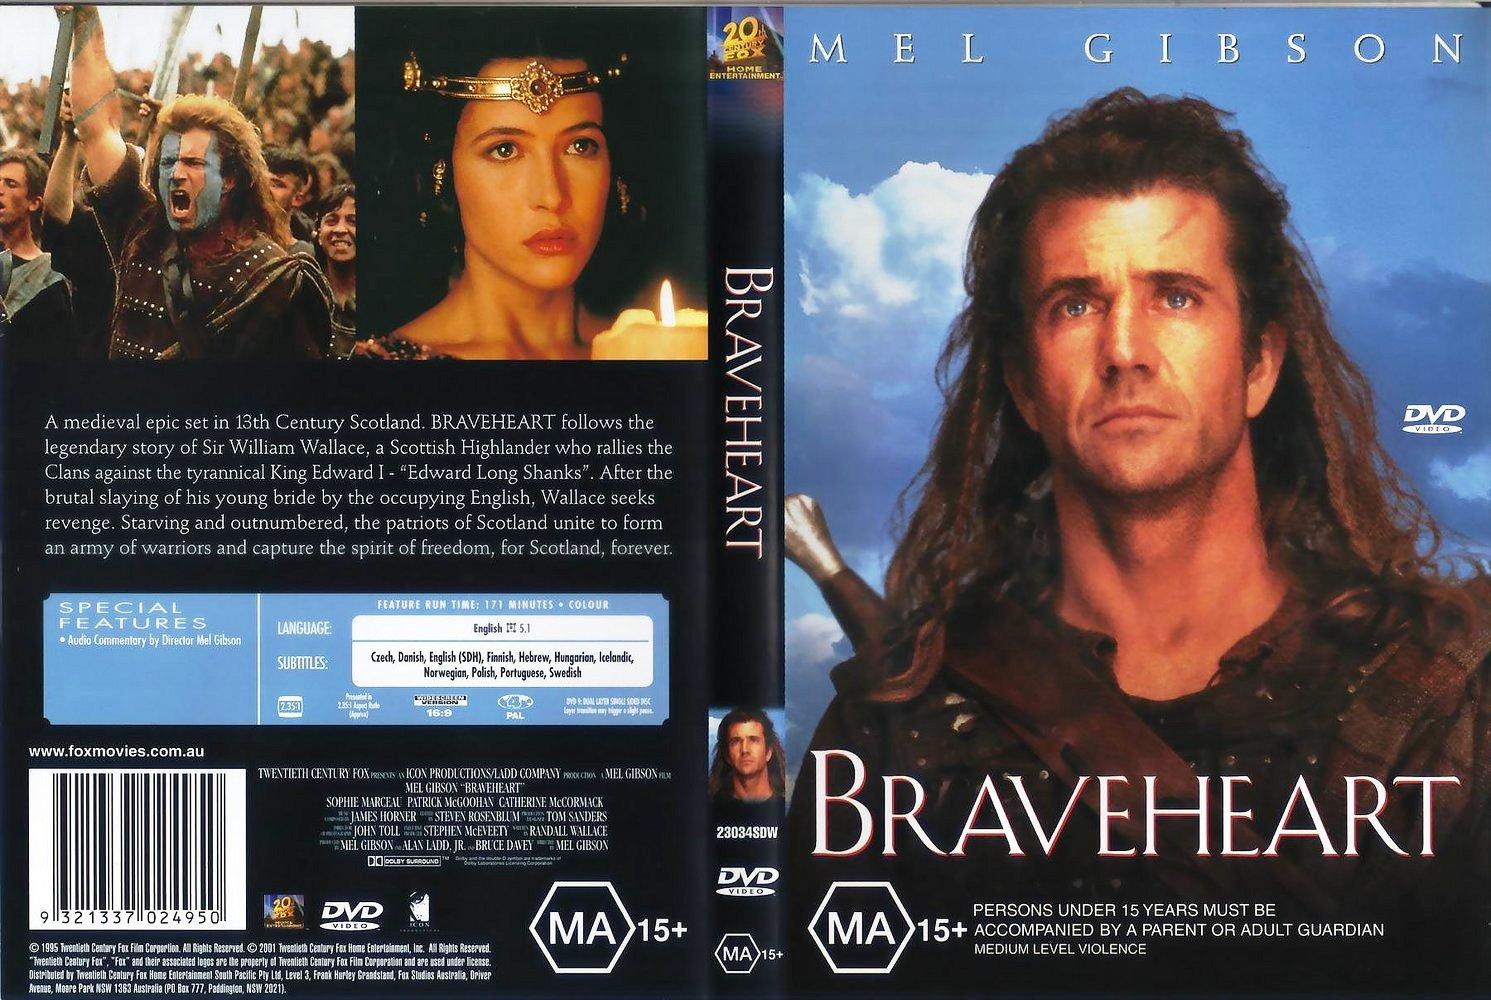 Braveheart Dvd Disk Cover